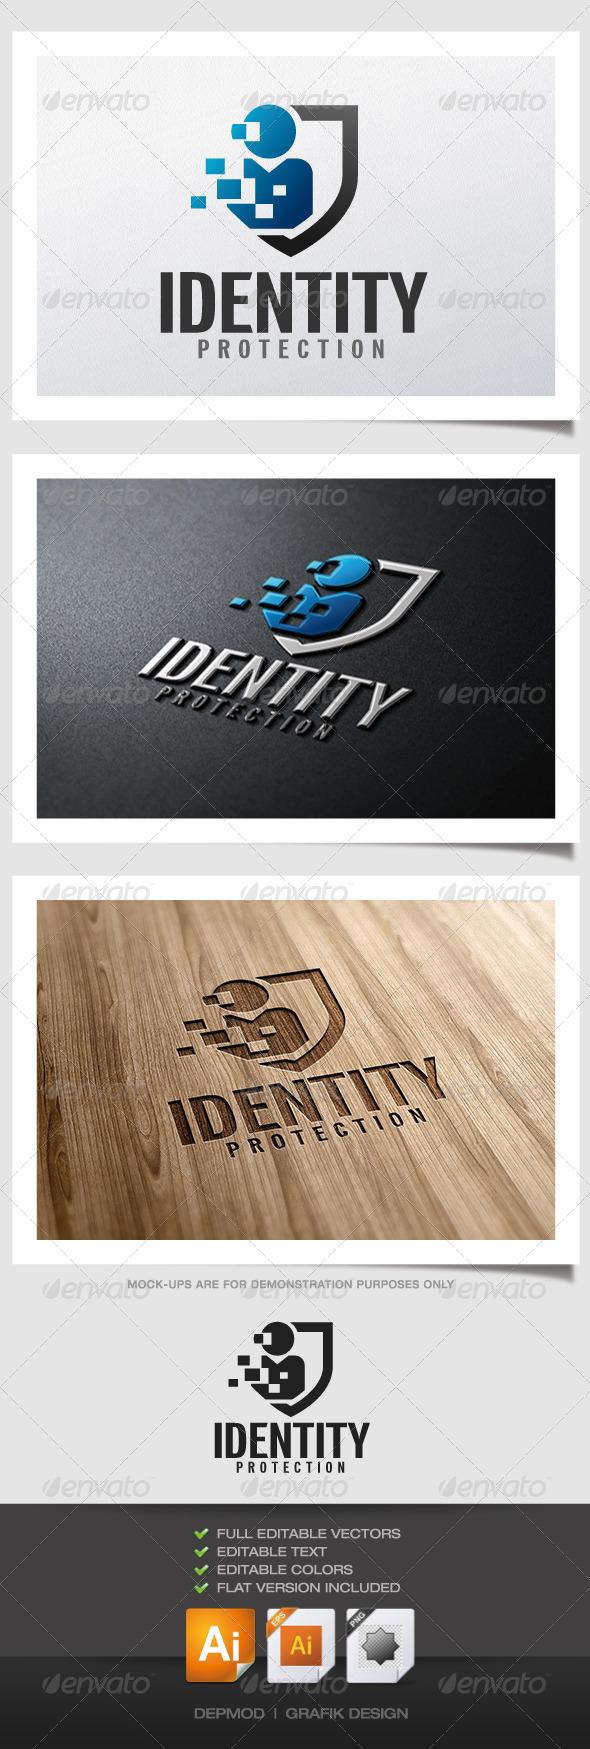 Identity Protection Logo